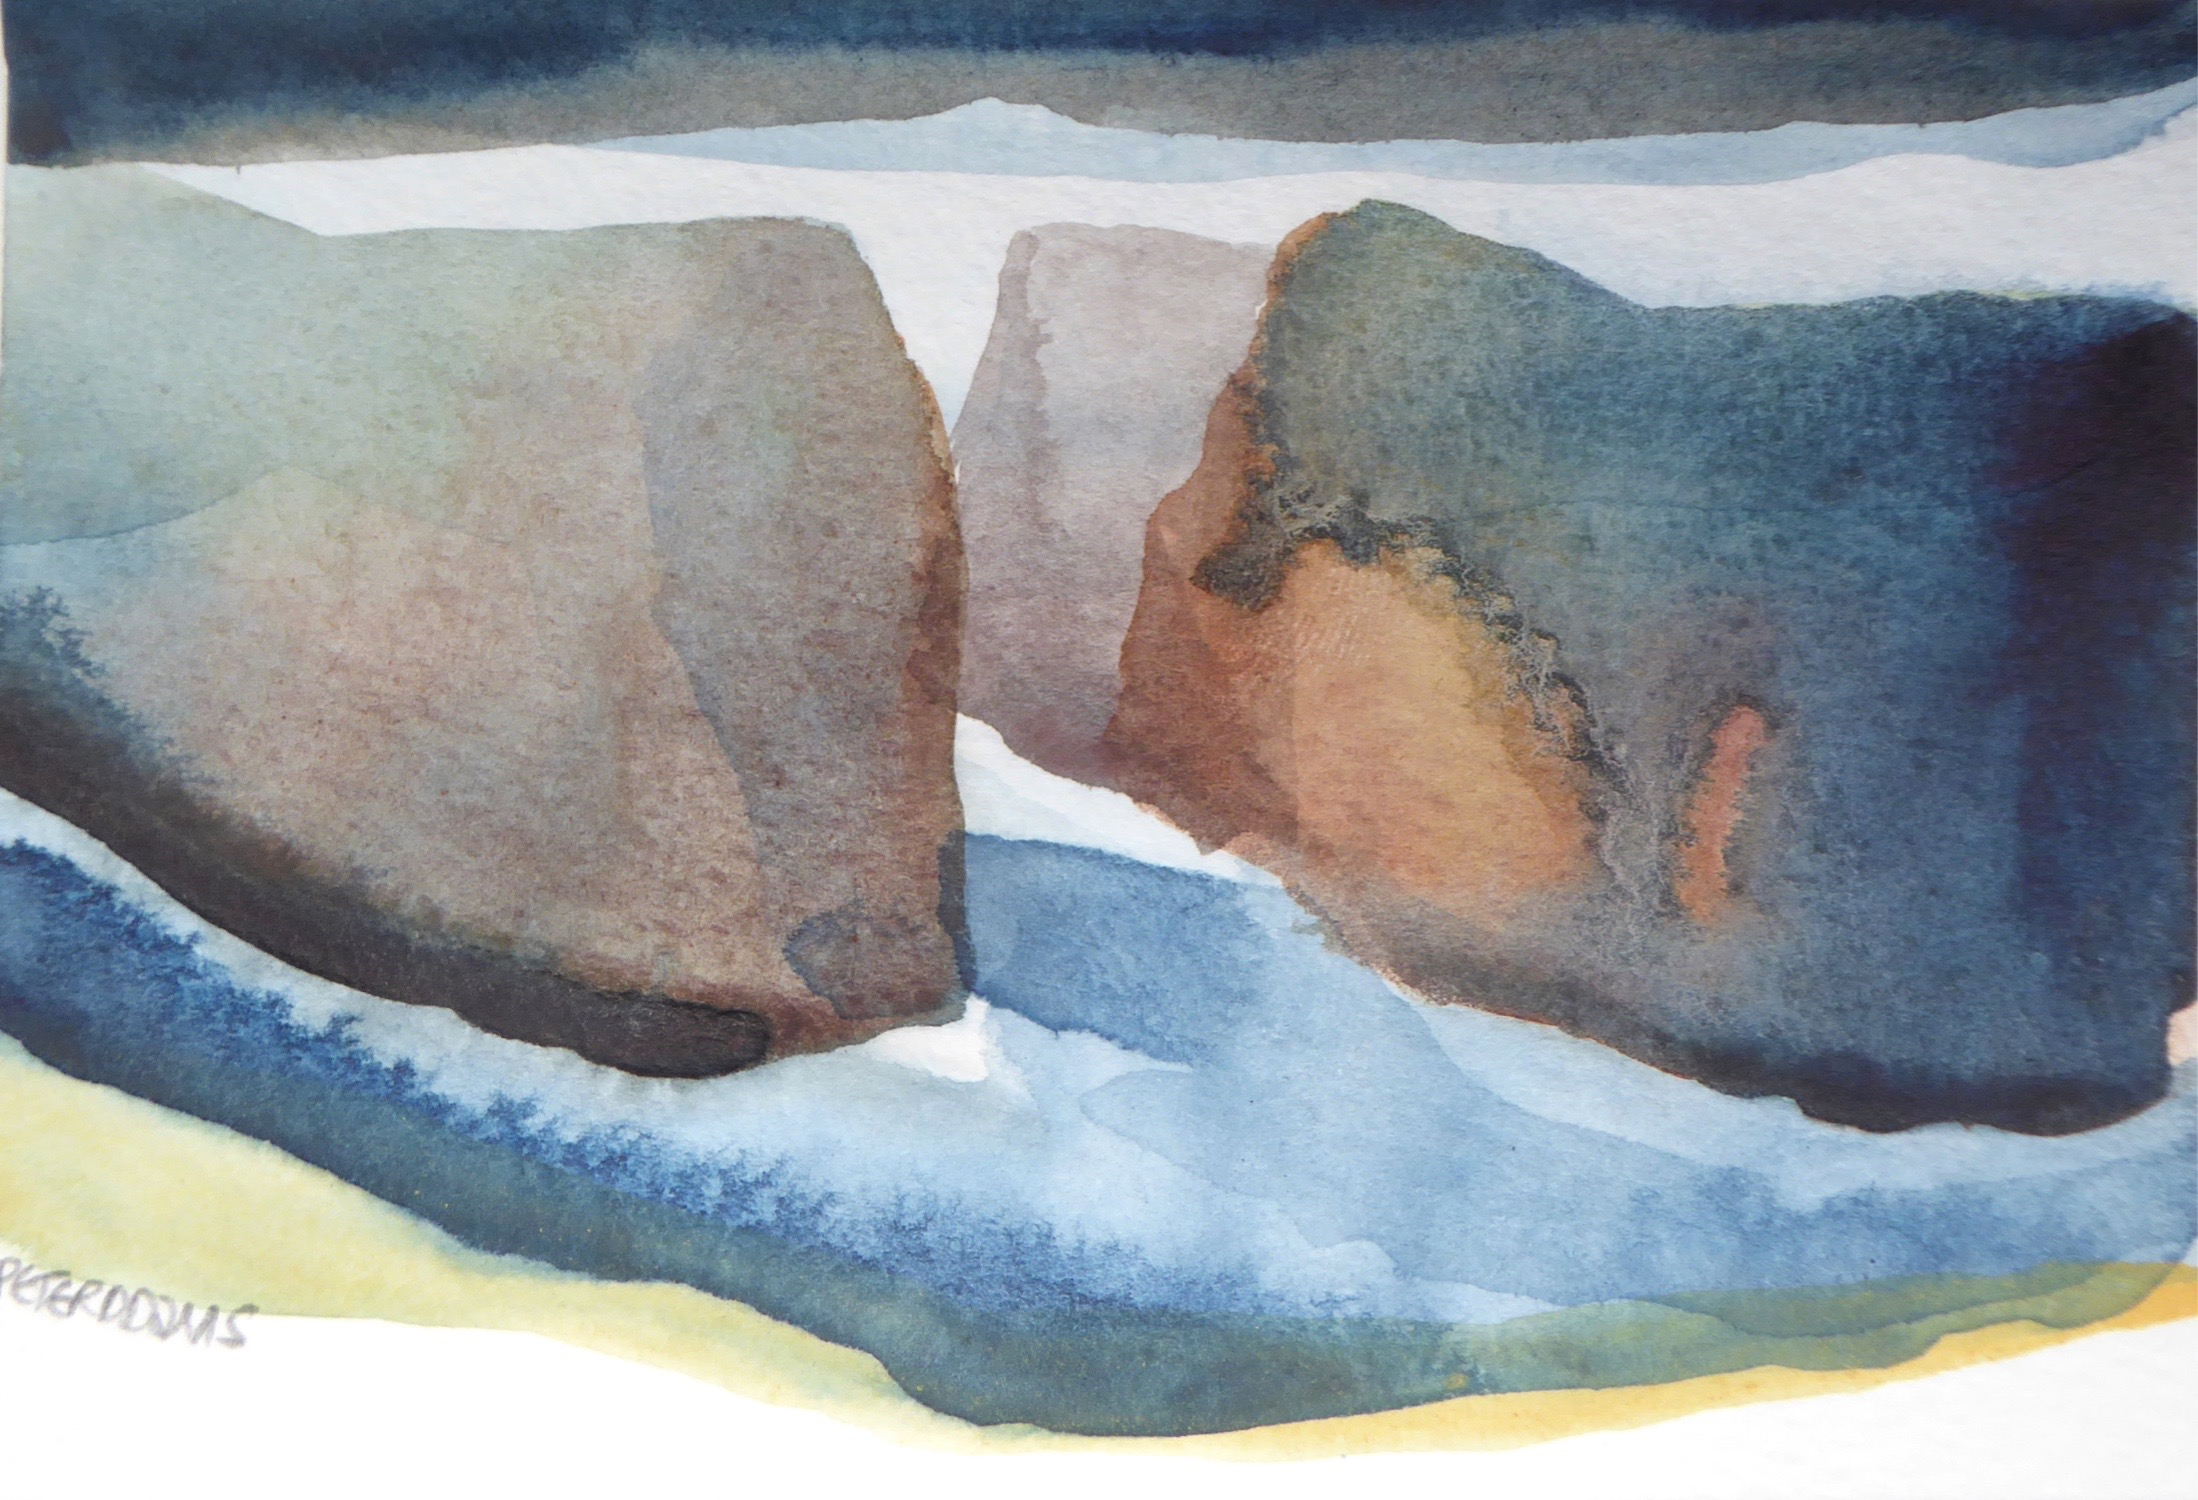 Peter Davis. Hams, Watercolour on paper 2017, (15x10cm)